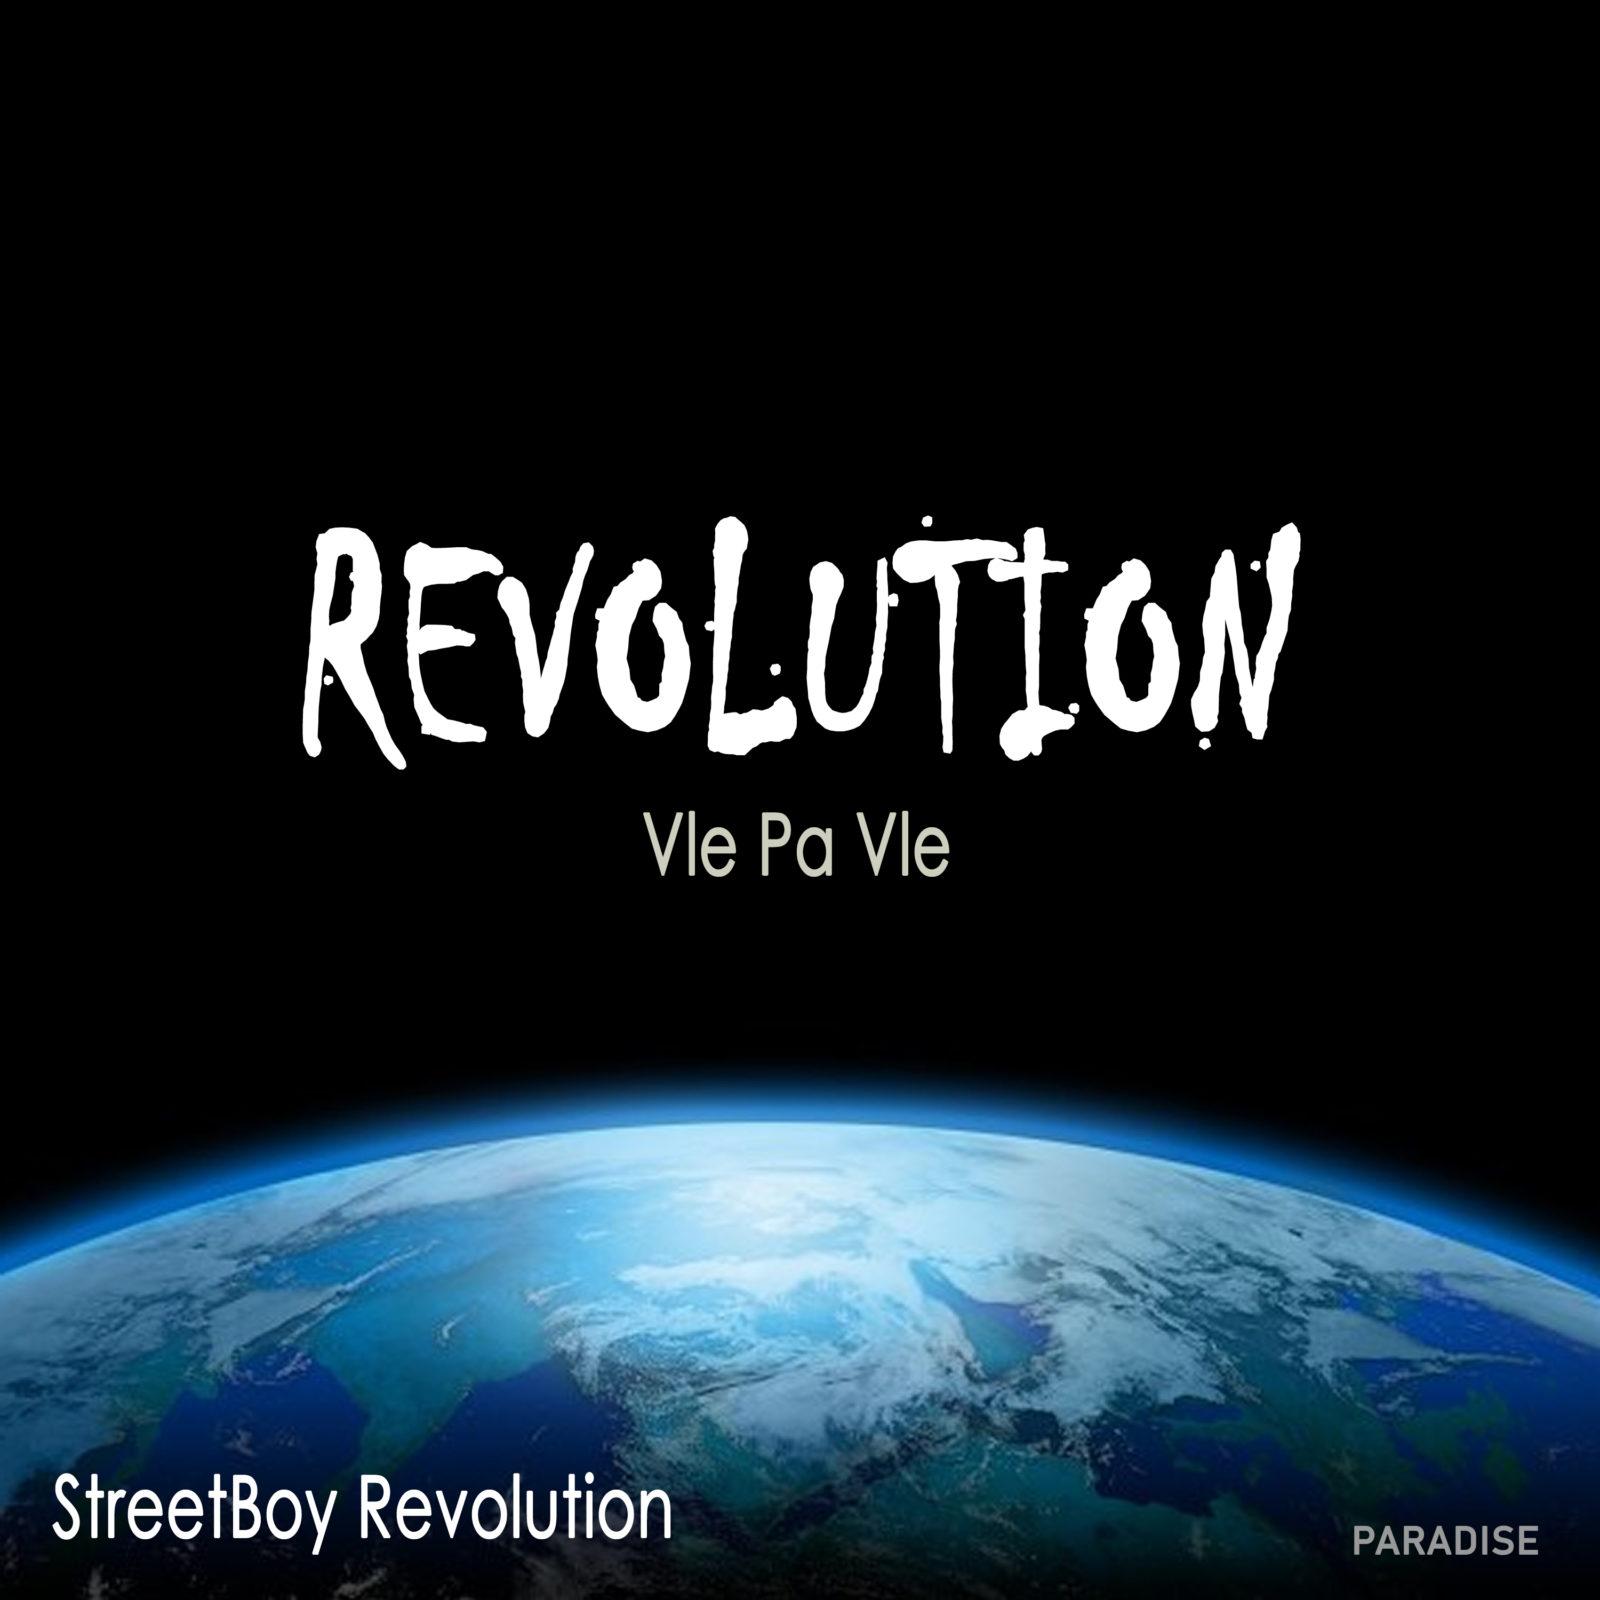 Vle pa Vle Fol Ale - Streetboy Revolution